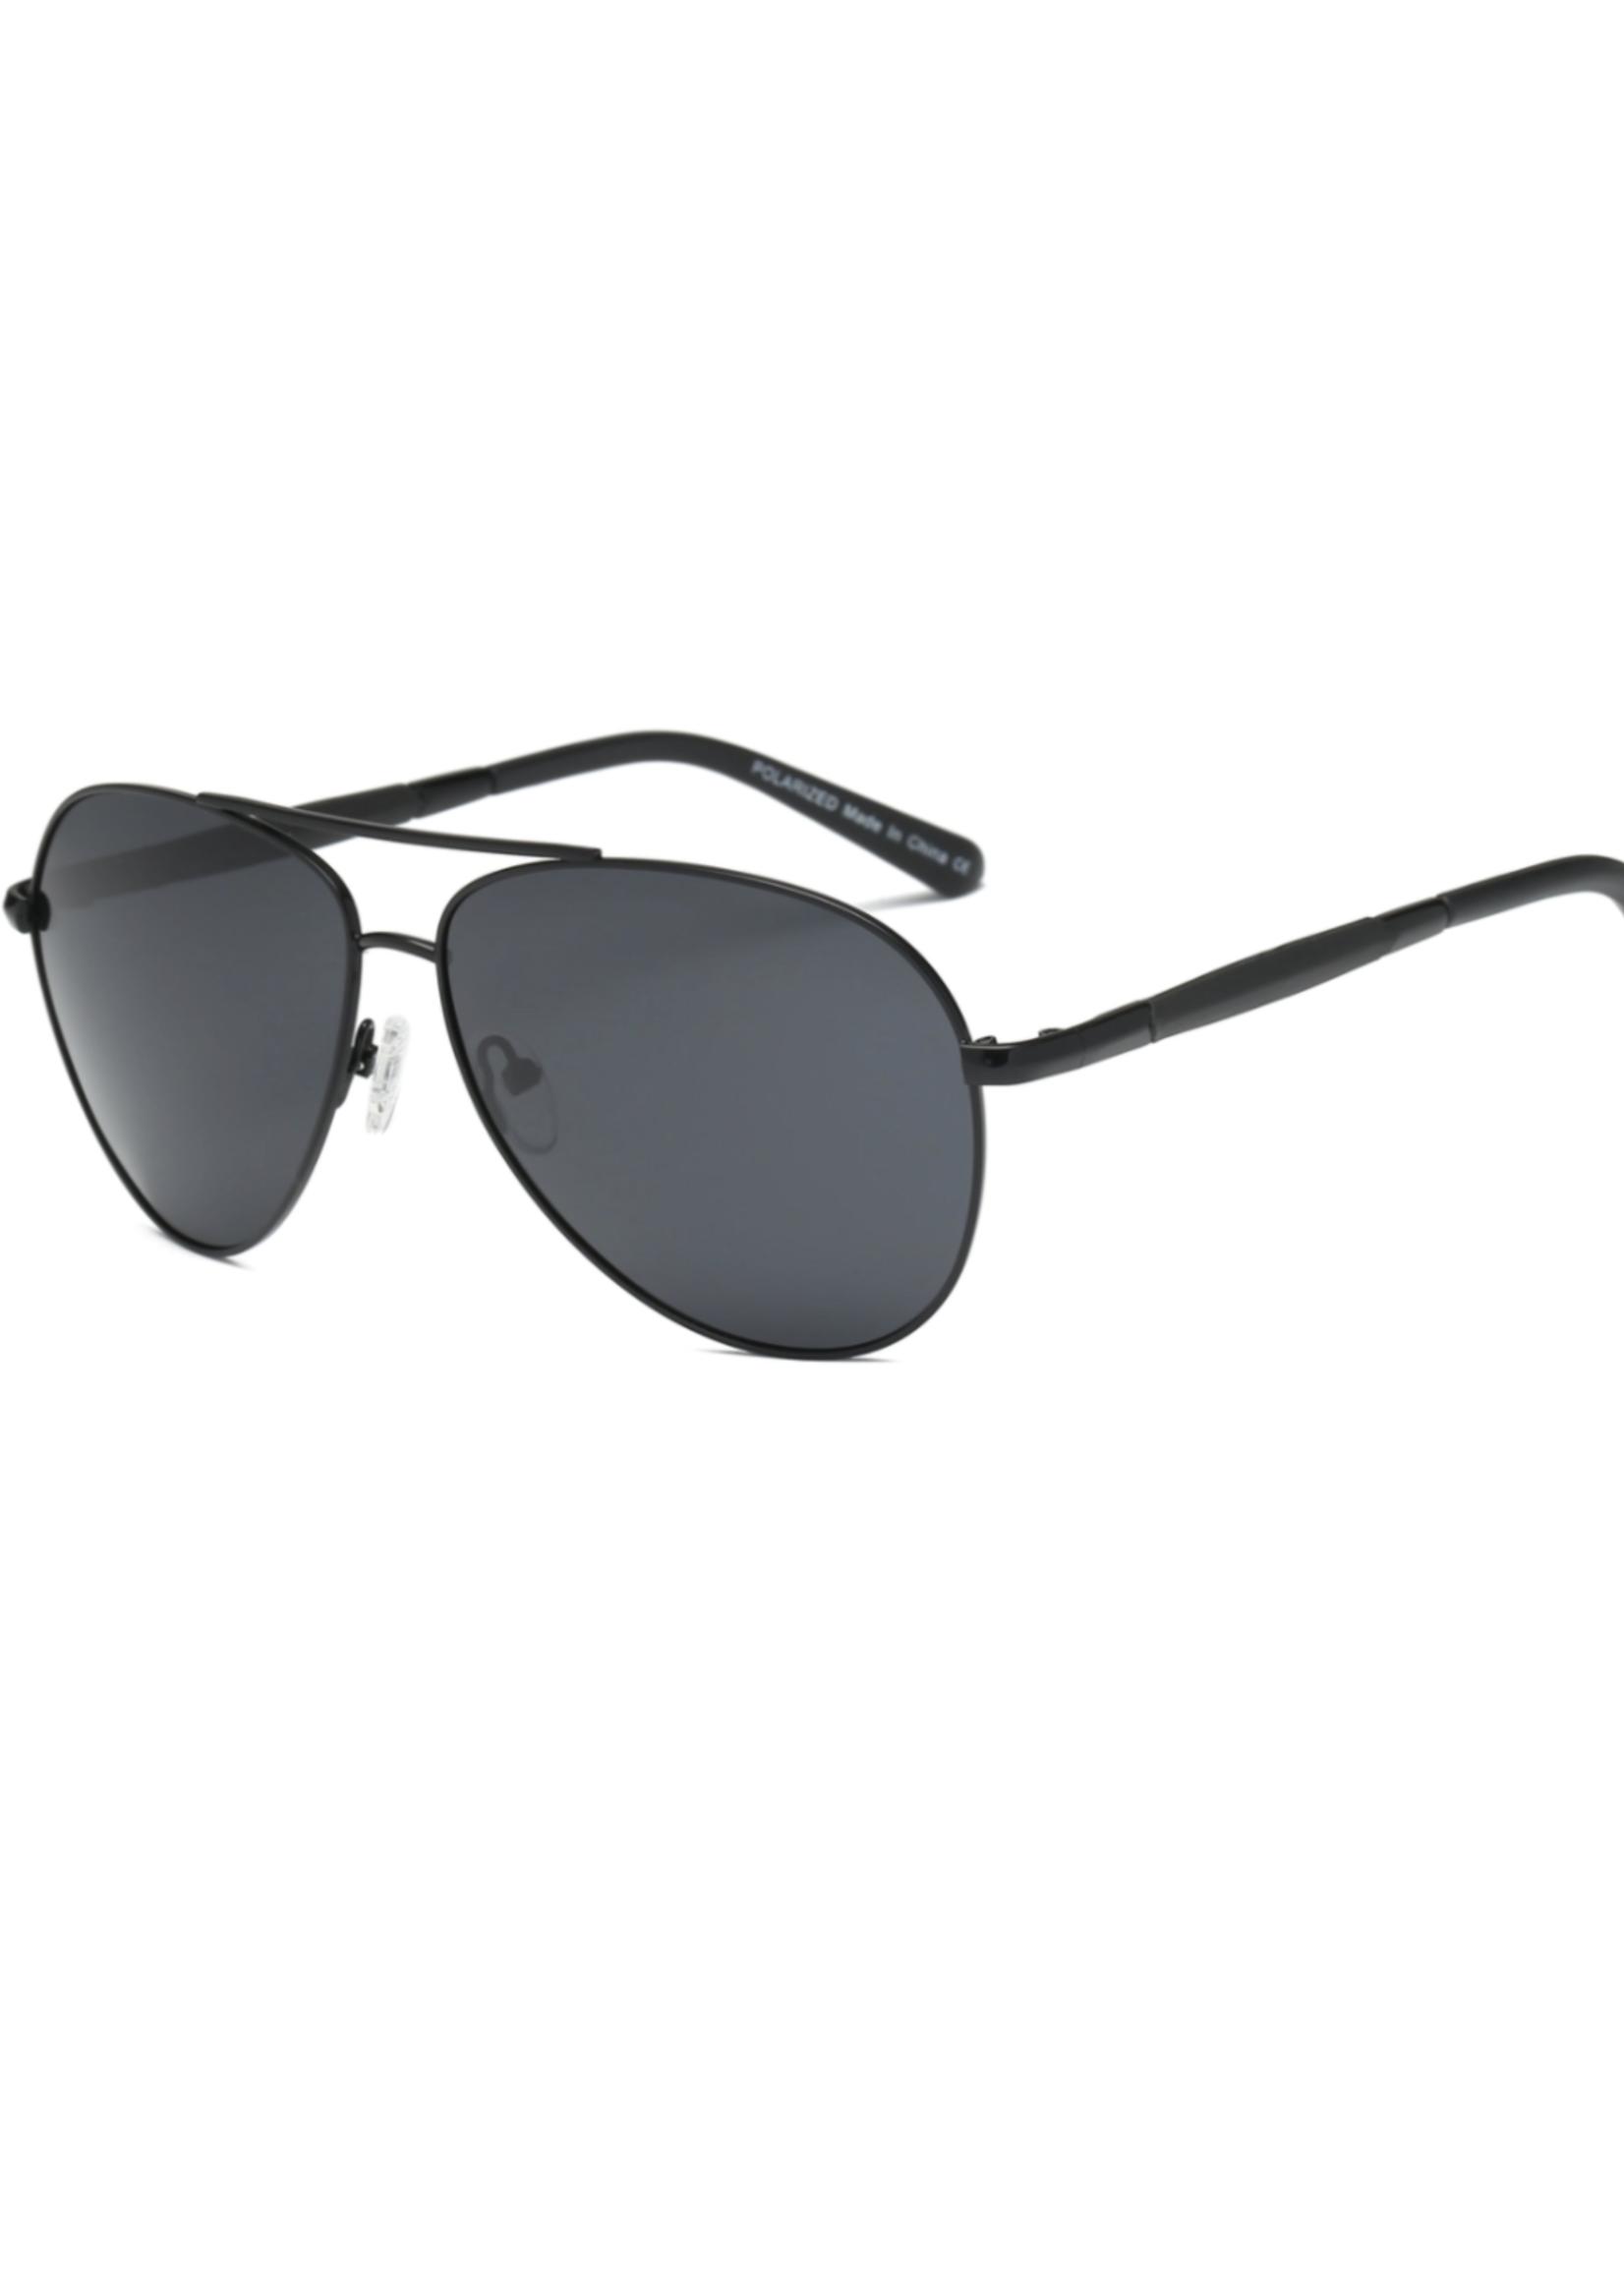 August Avenue Eyewear Tampa | Aviator Sunglasses